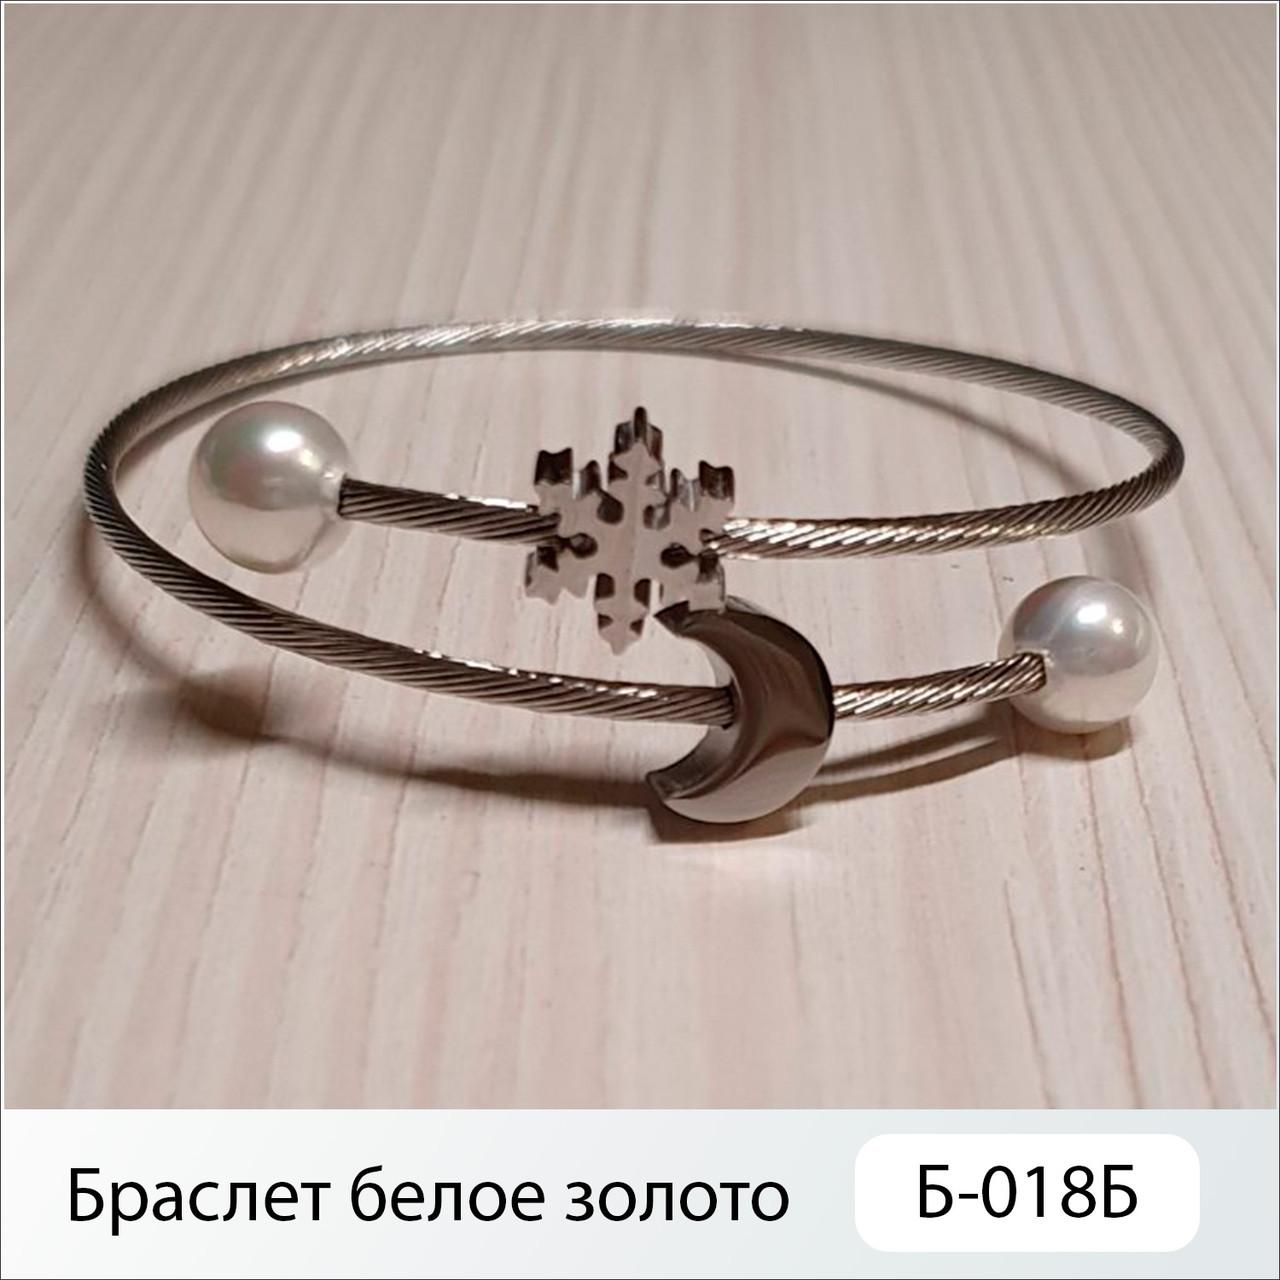 Браслет белое золото Б-018Б